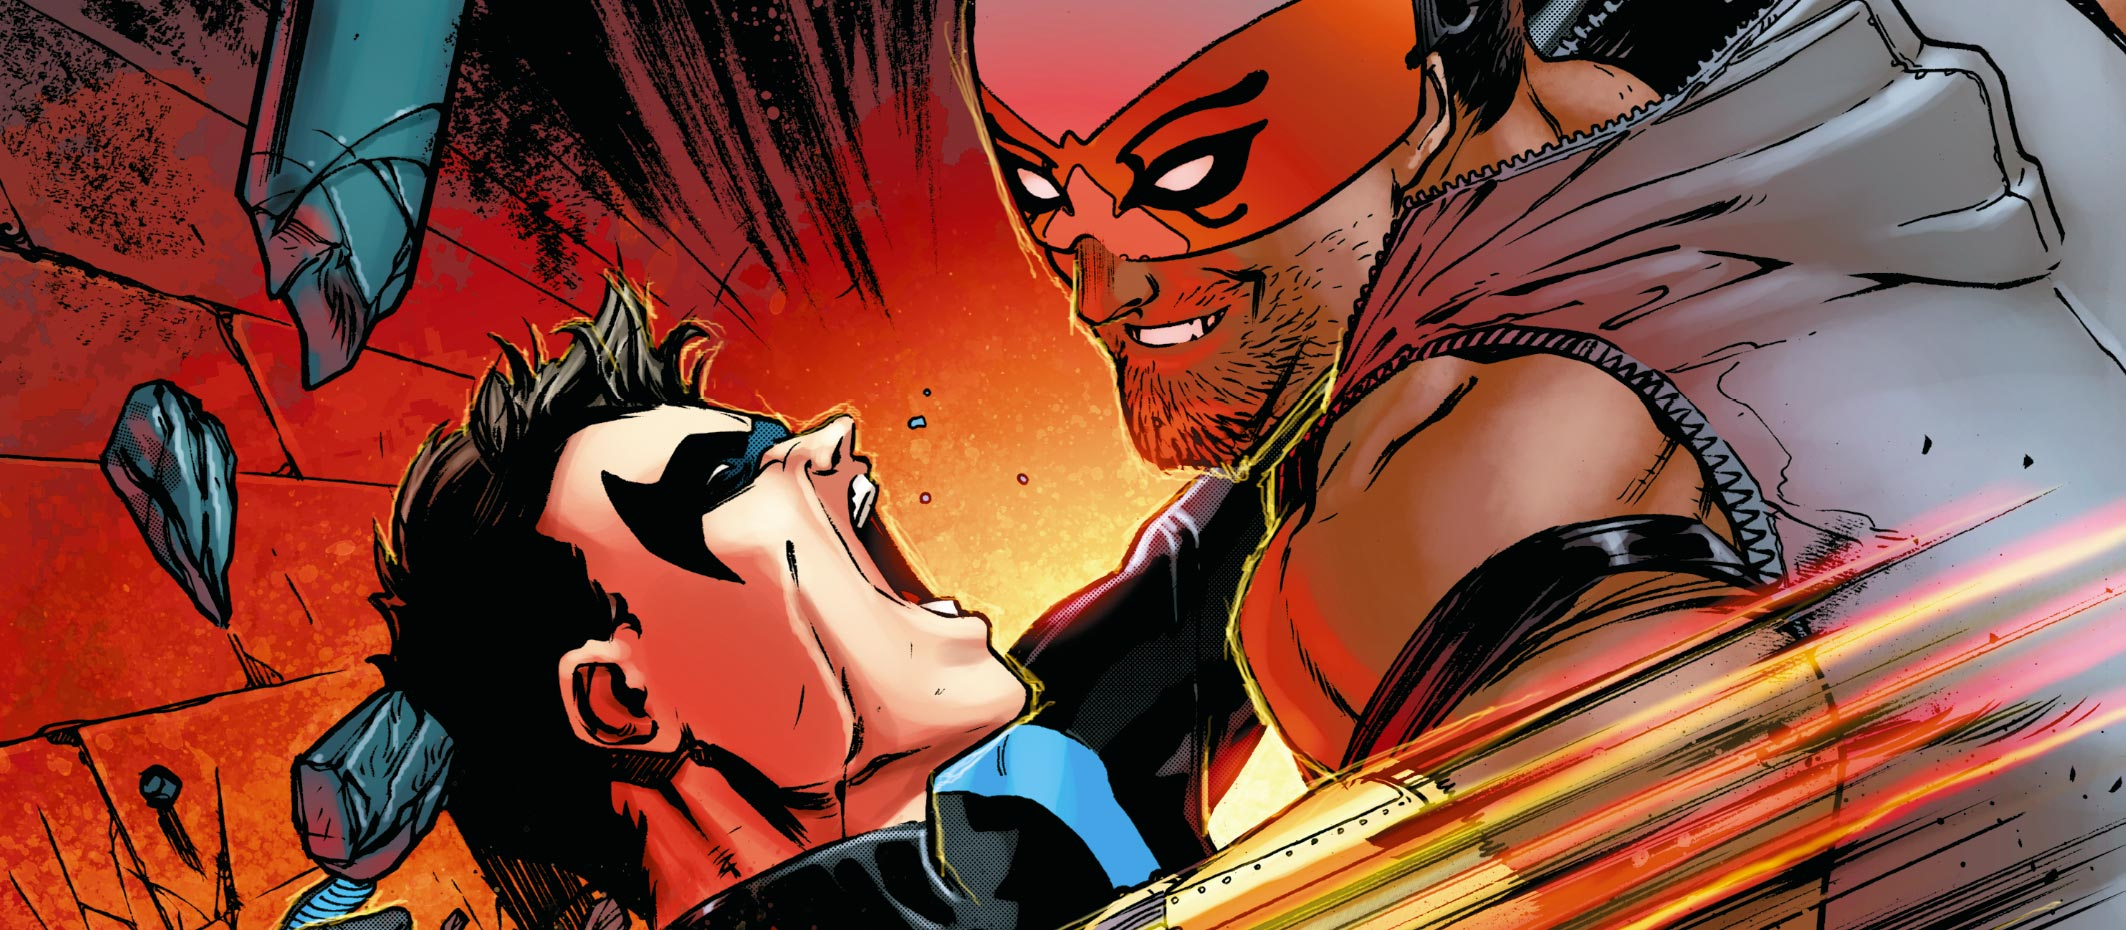 Lequel de ces emplois Nightwing n'a jamais exercé ?